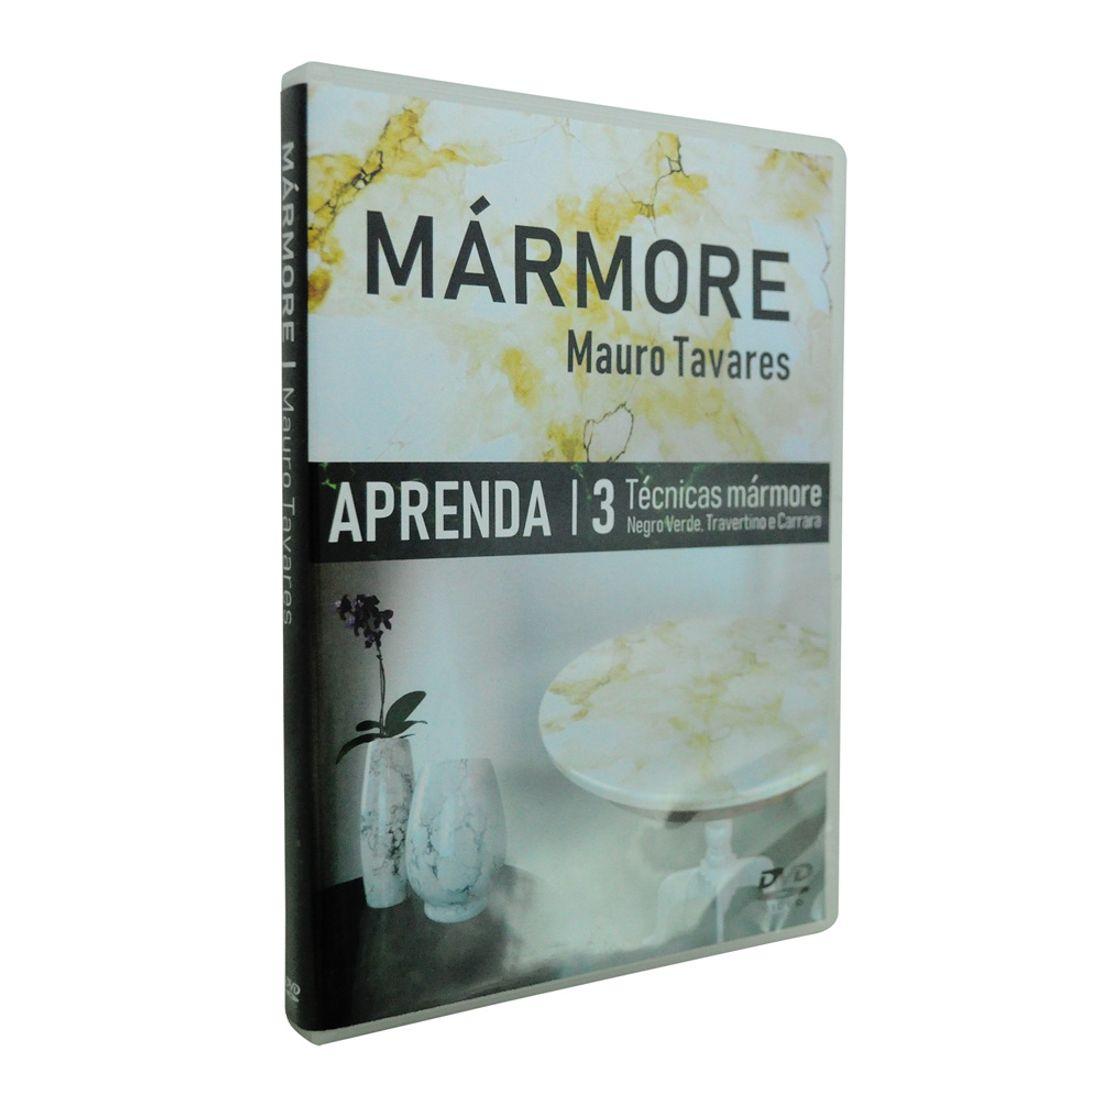 DVD_CURSO_EFEITO_MARMORE_PERFIL